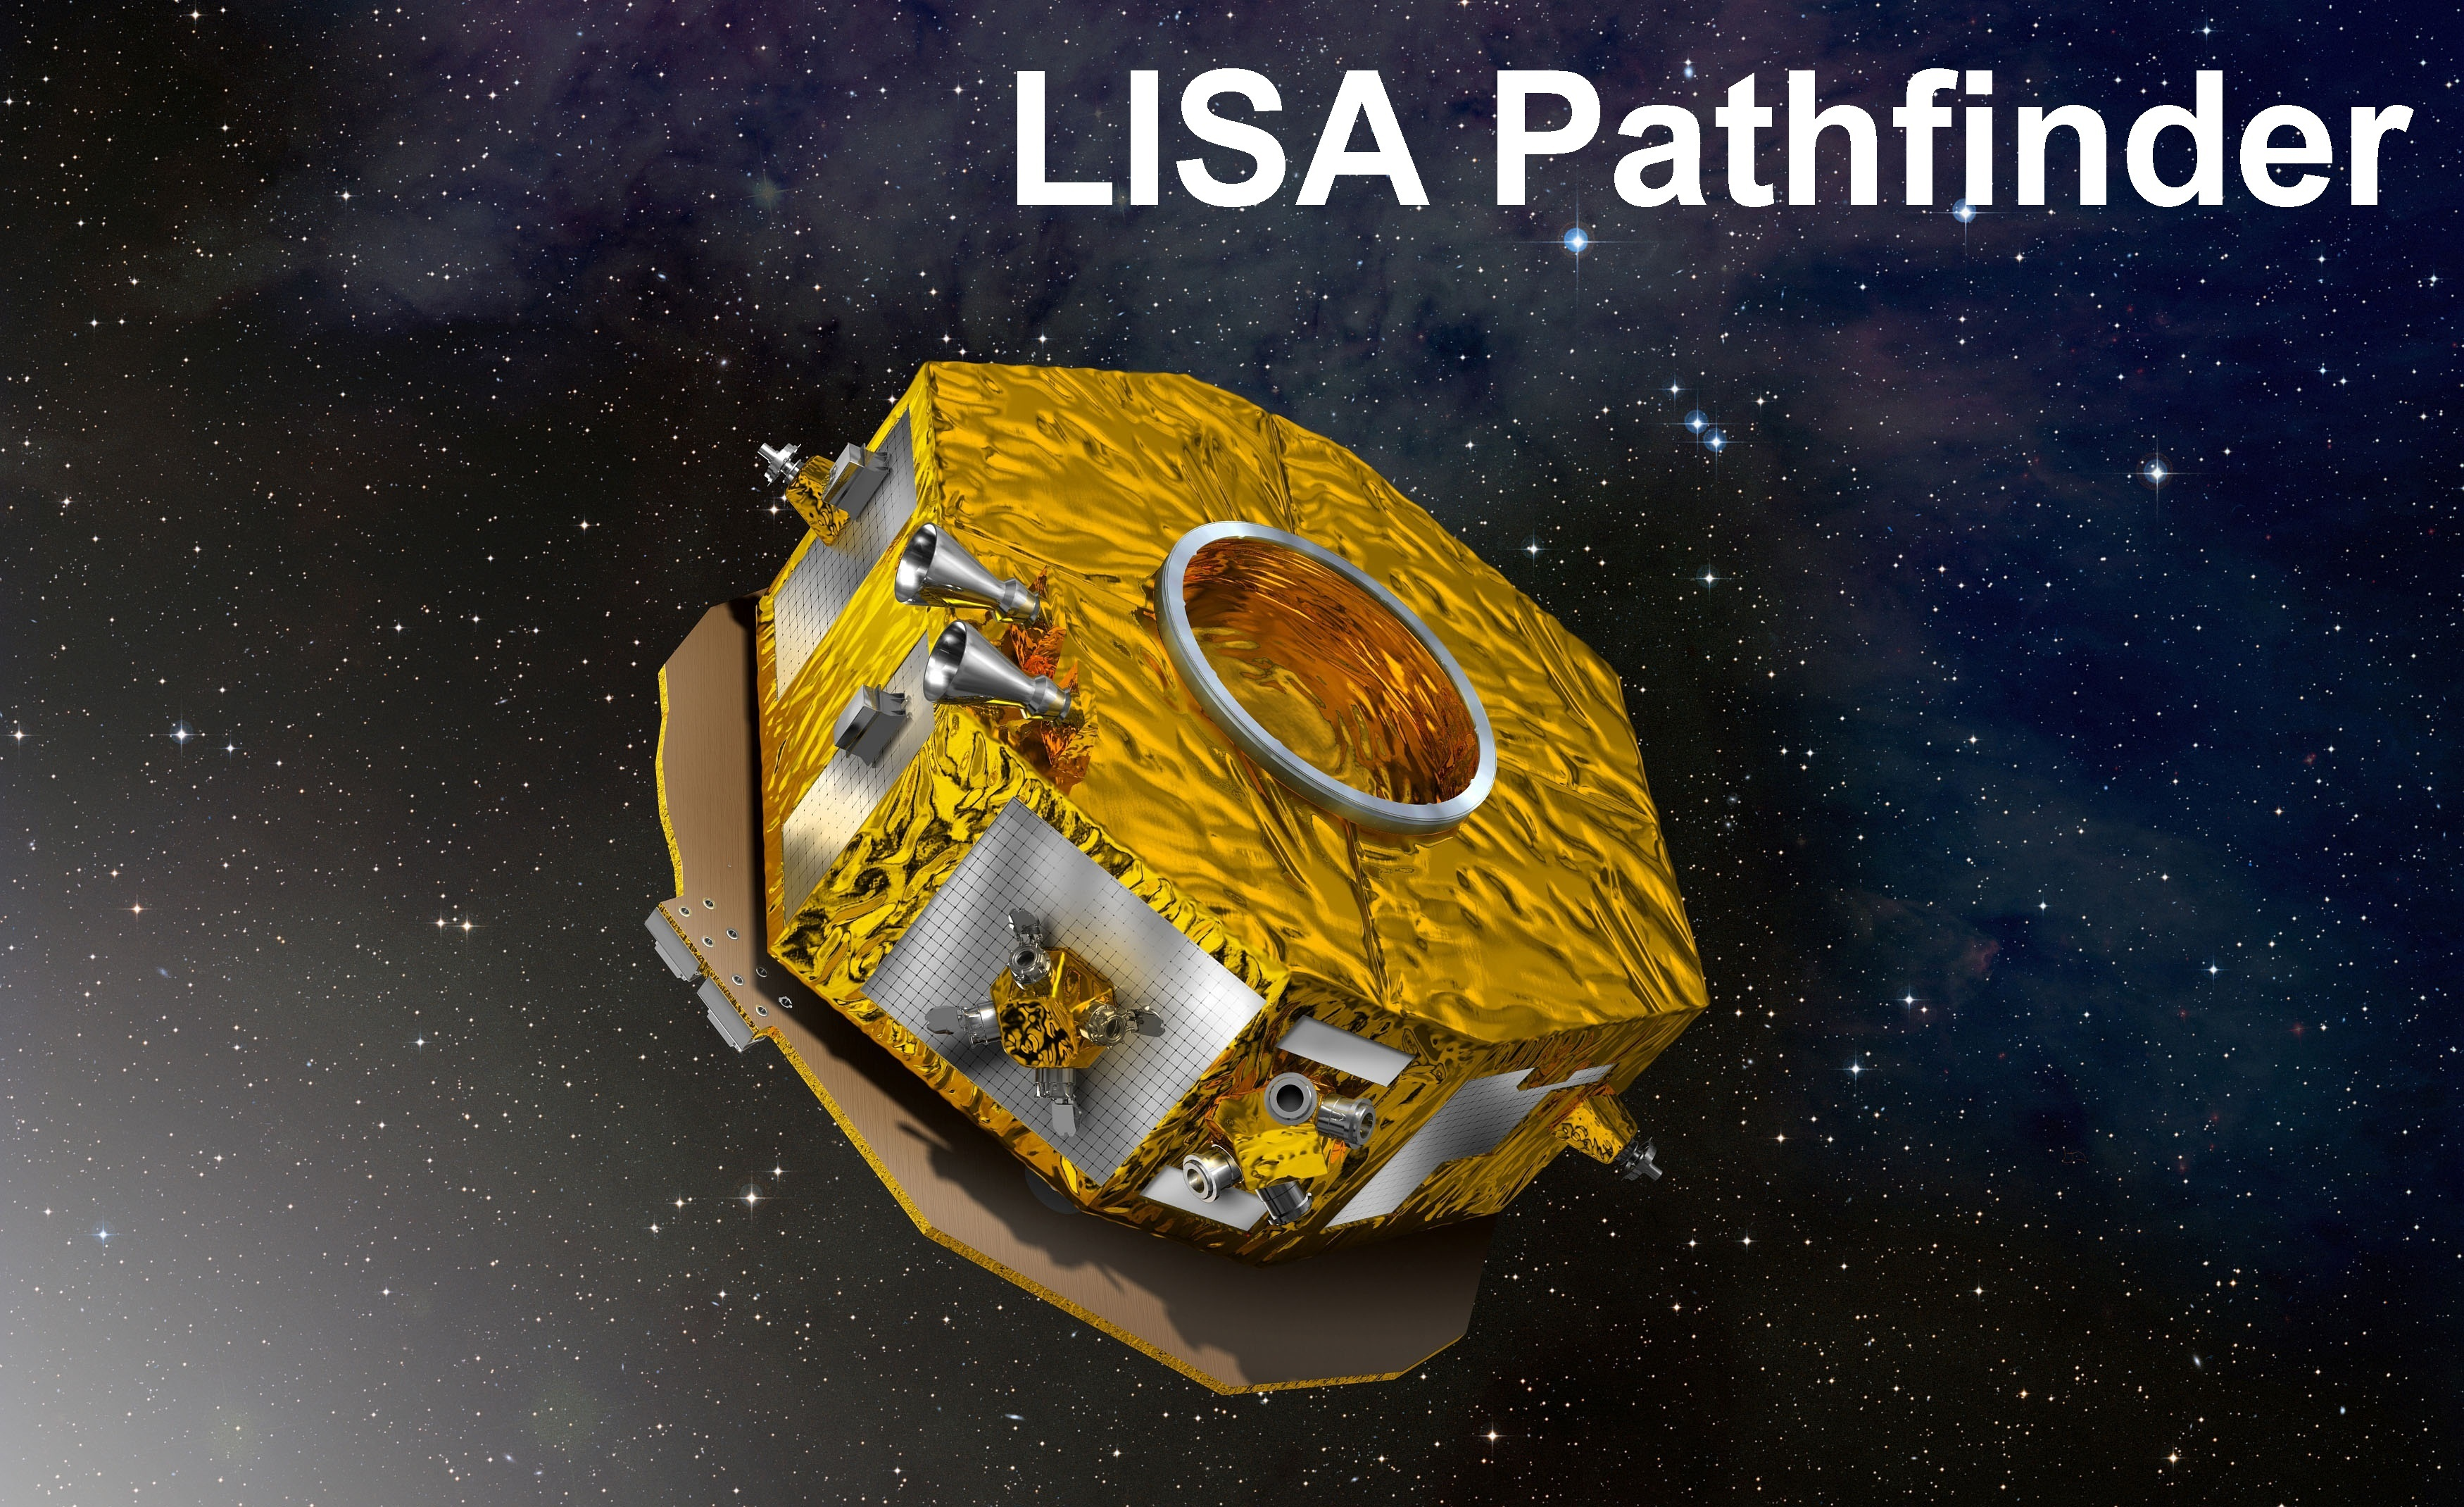 LISA Pathfinder | Spaceflight1...